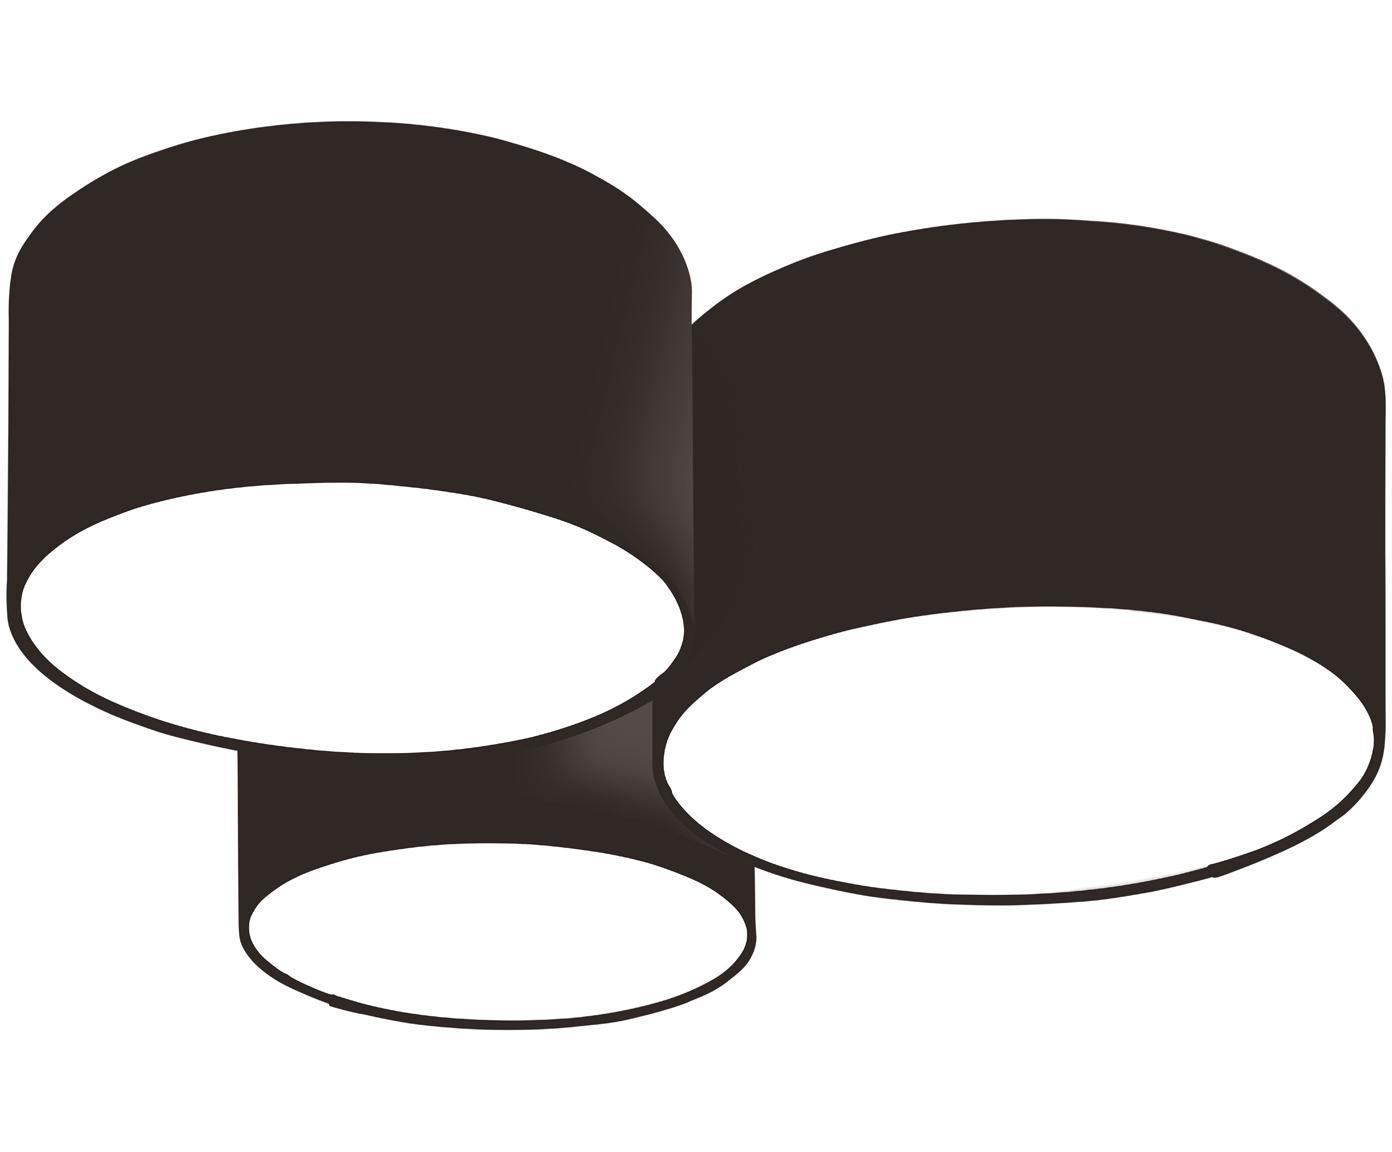 Lampa sufitowa Luke, Czarny, ∅ 61 x W 26 cm